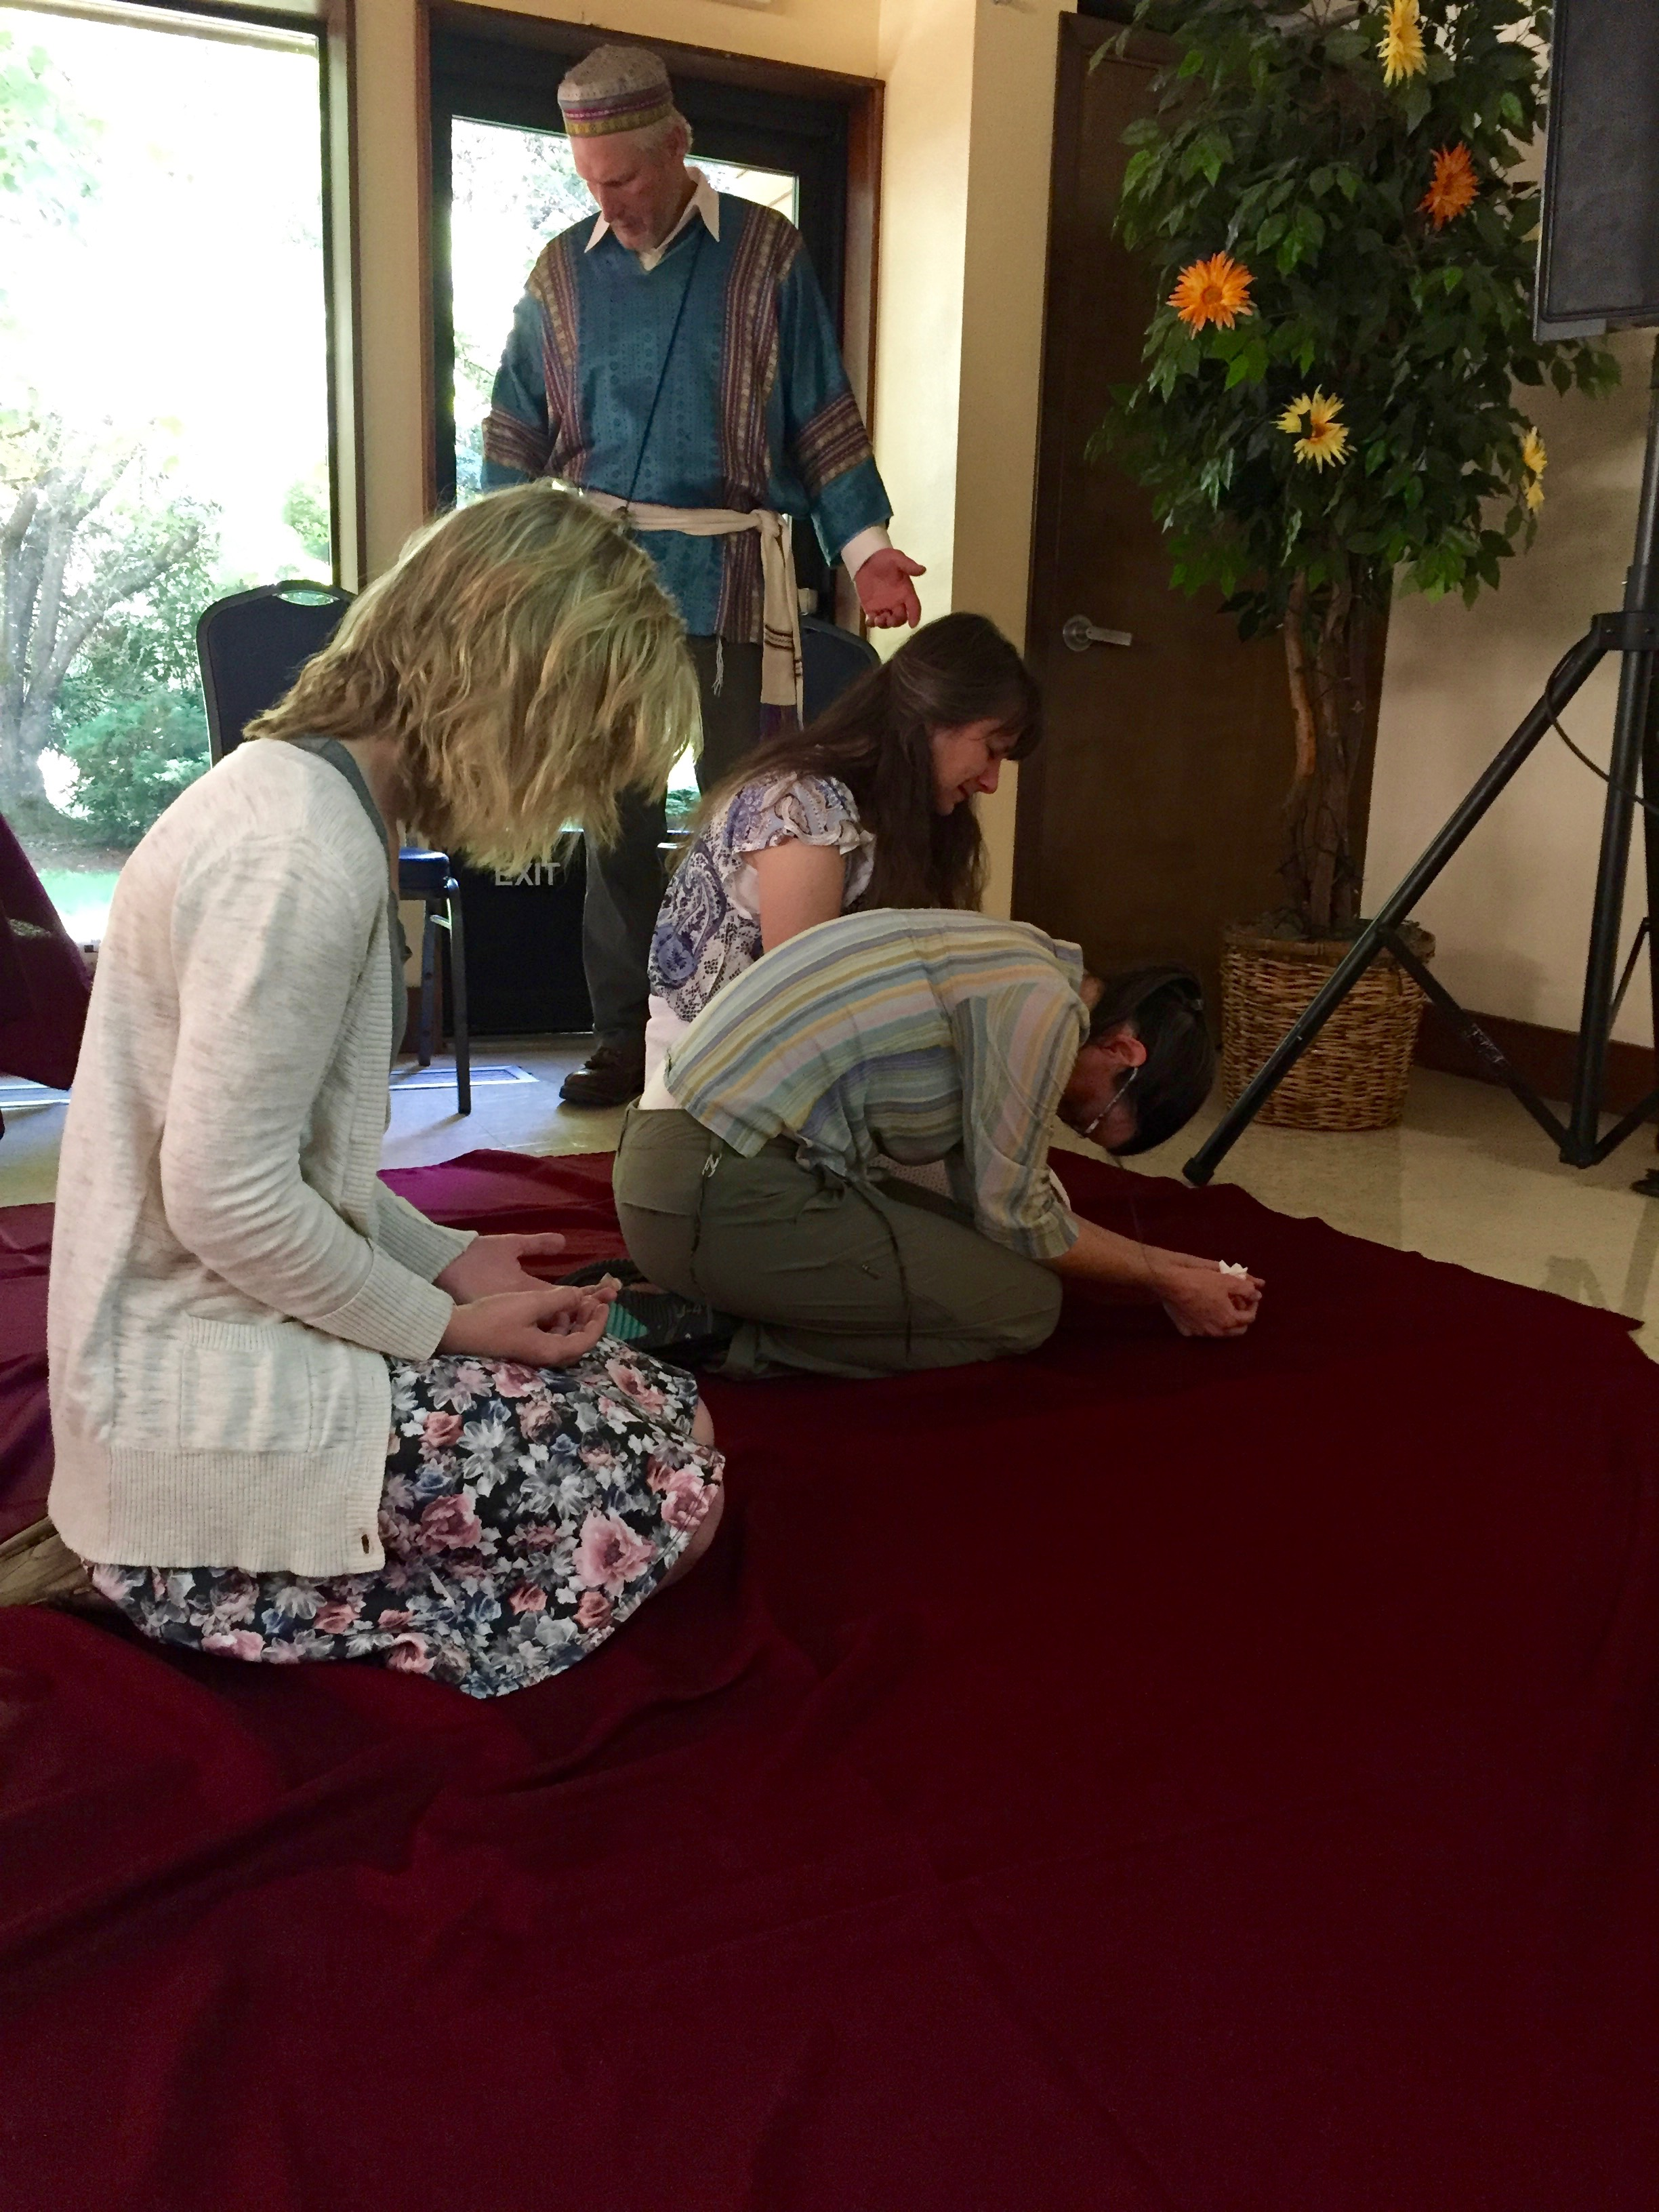 Seeking the face of YHVH through prayer